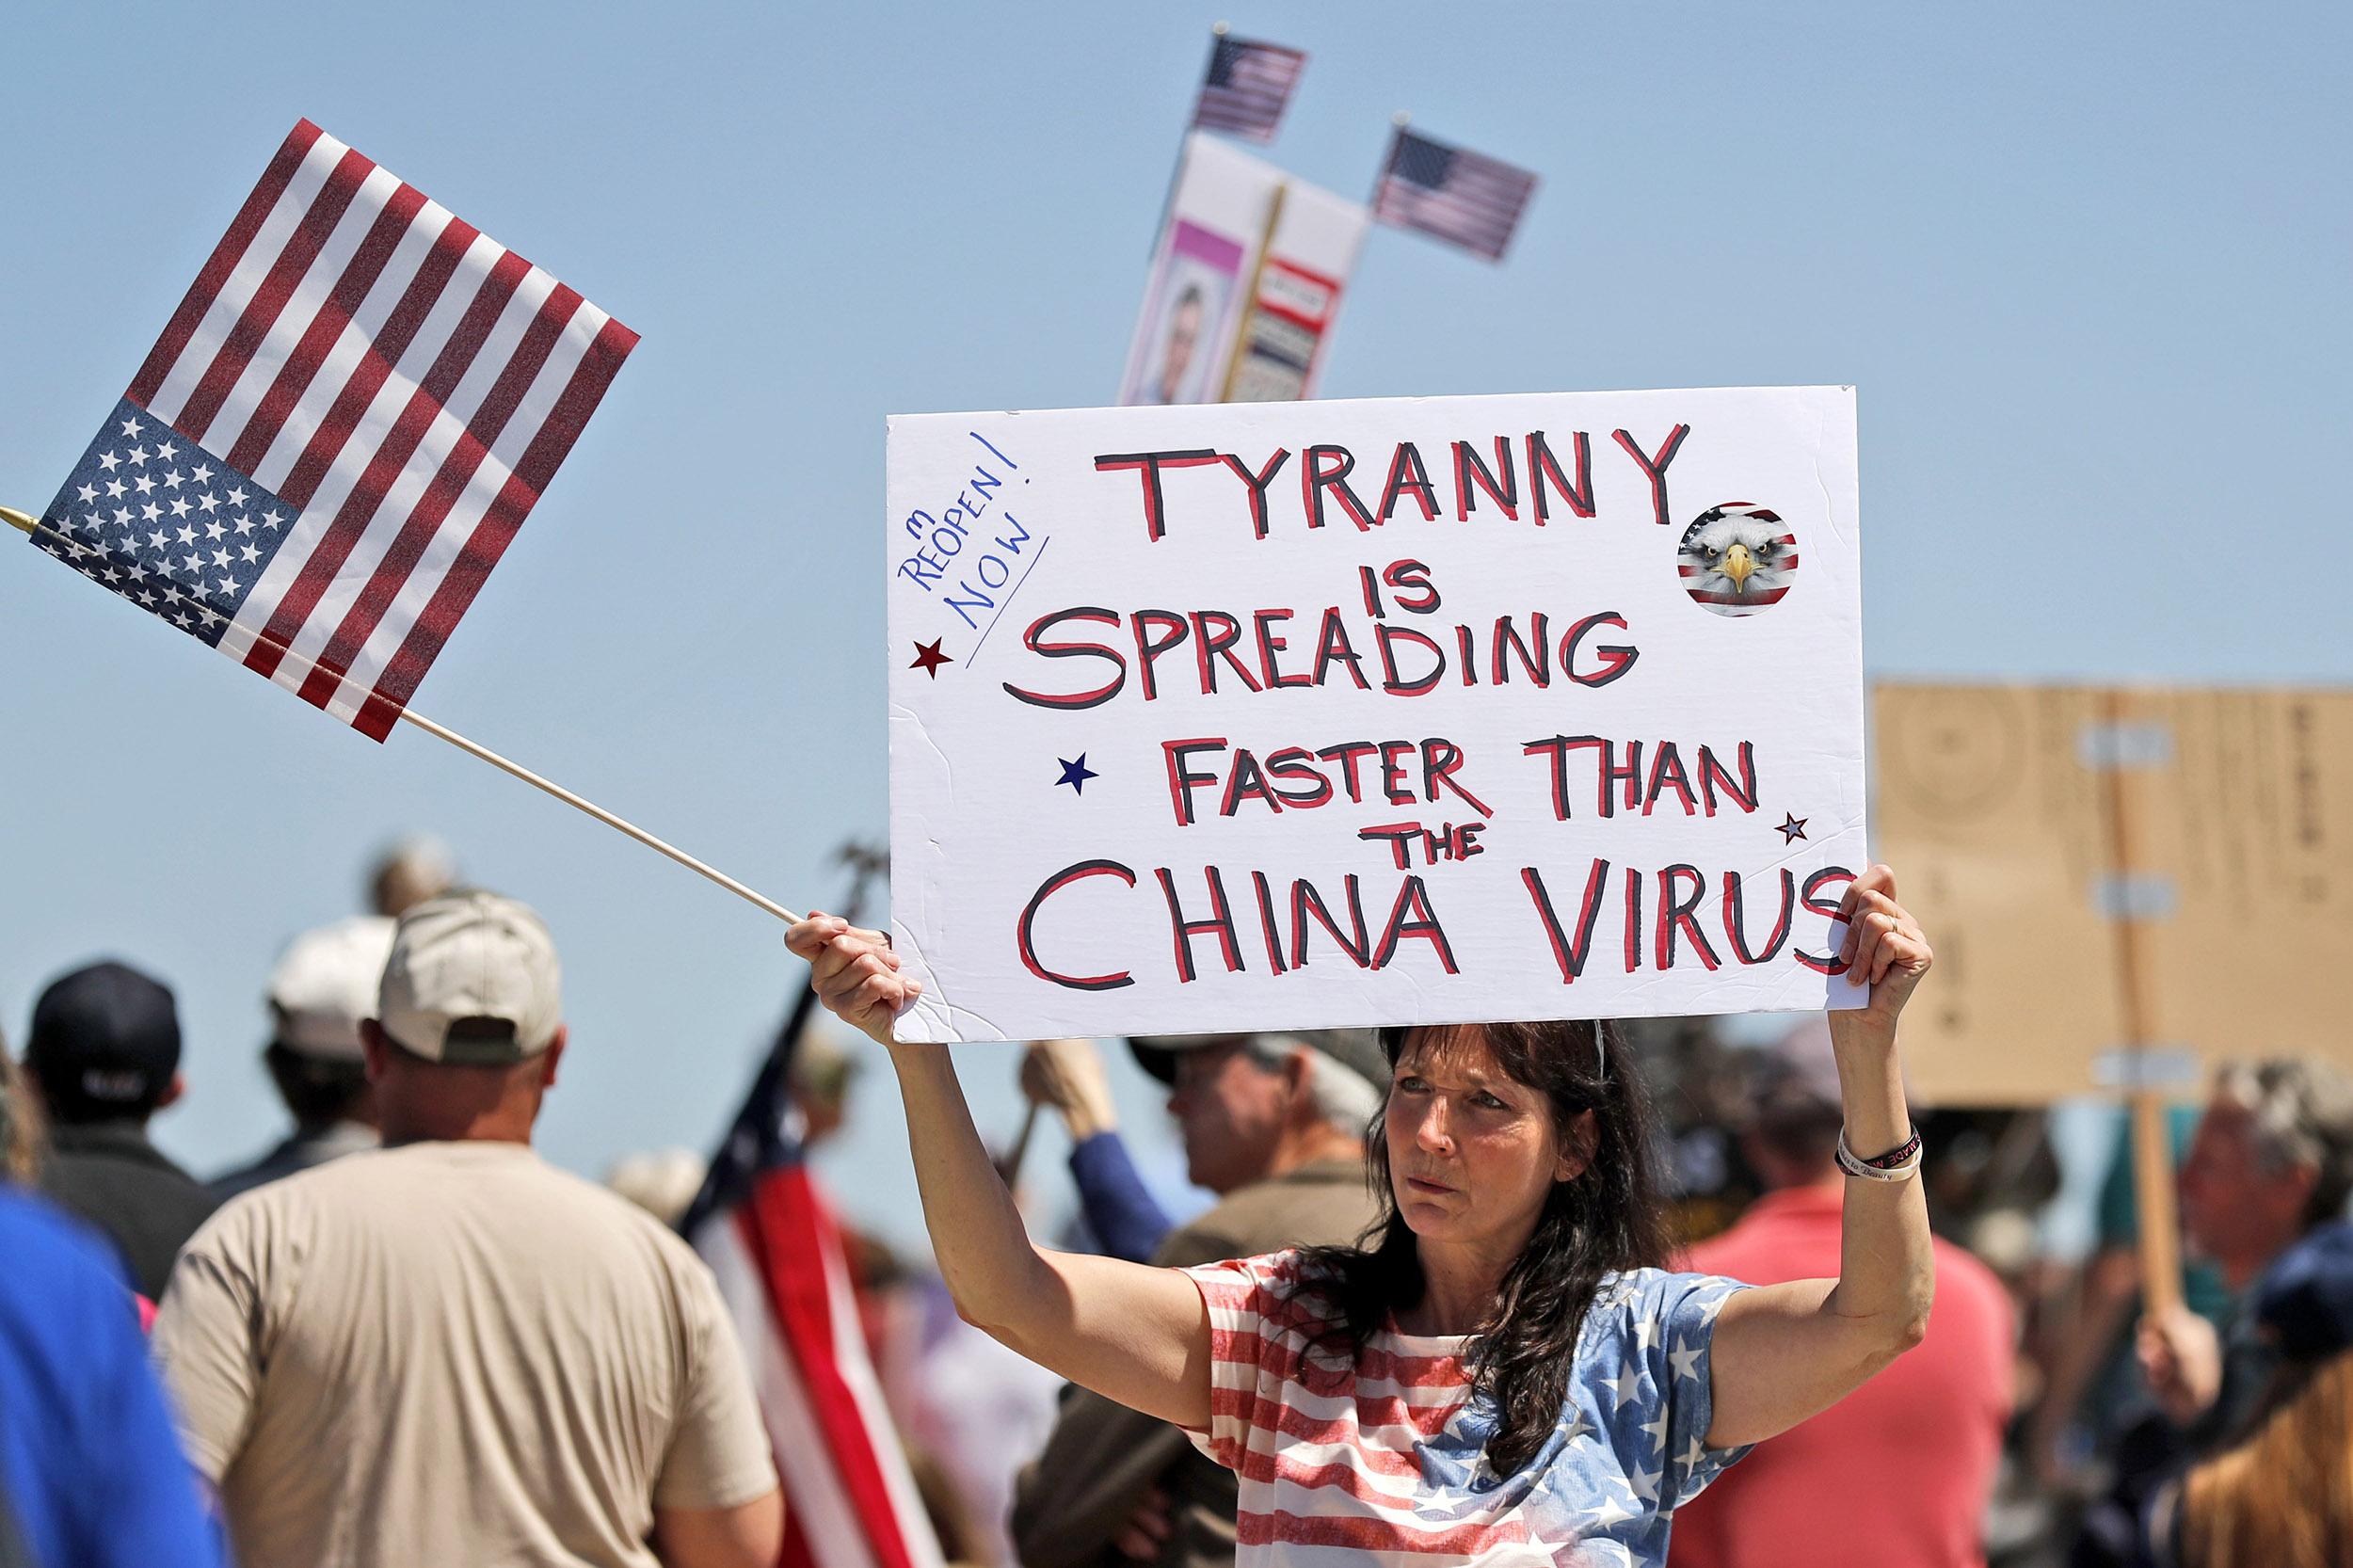 Missouri files lawsuit against China over coronavirus, Beijing calls claims  'absurd'